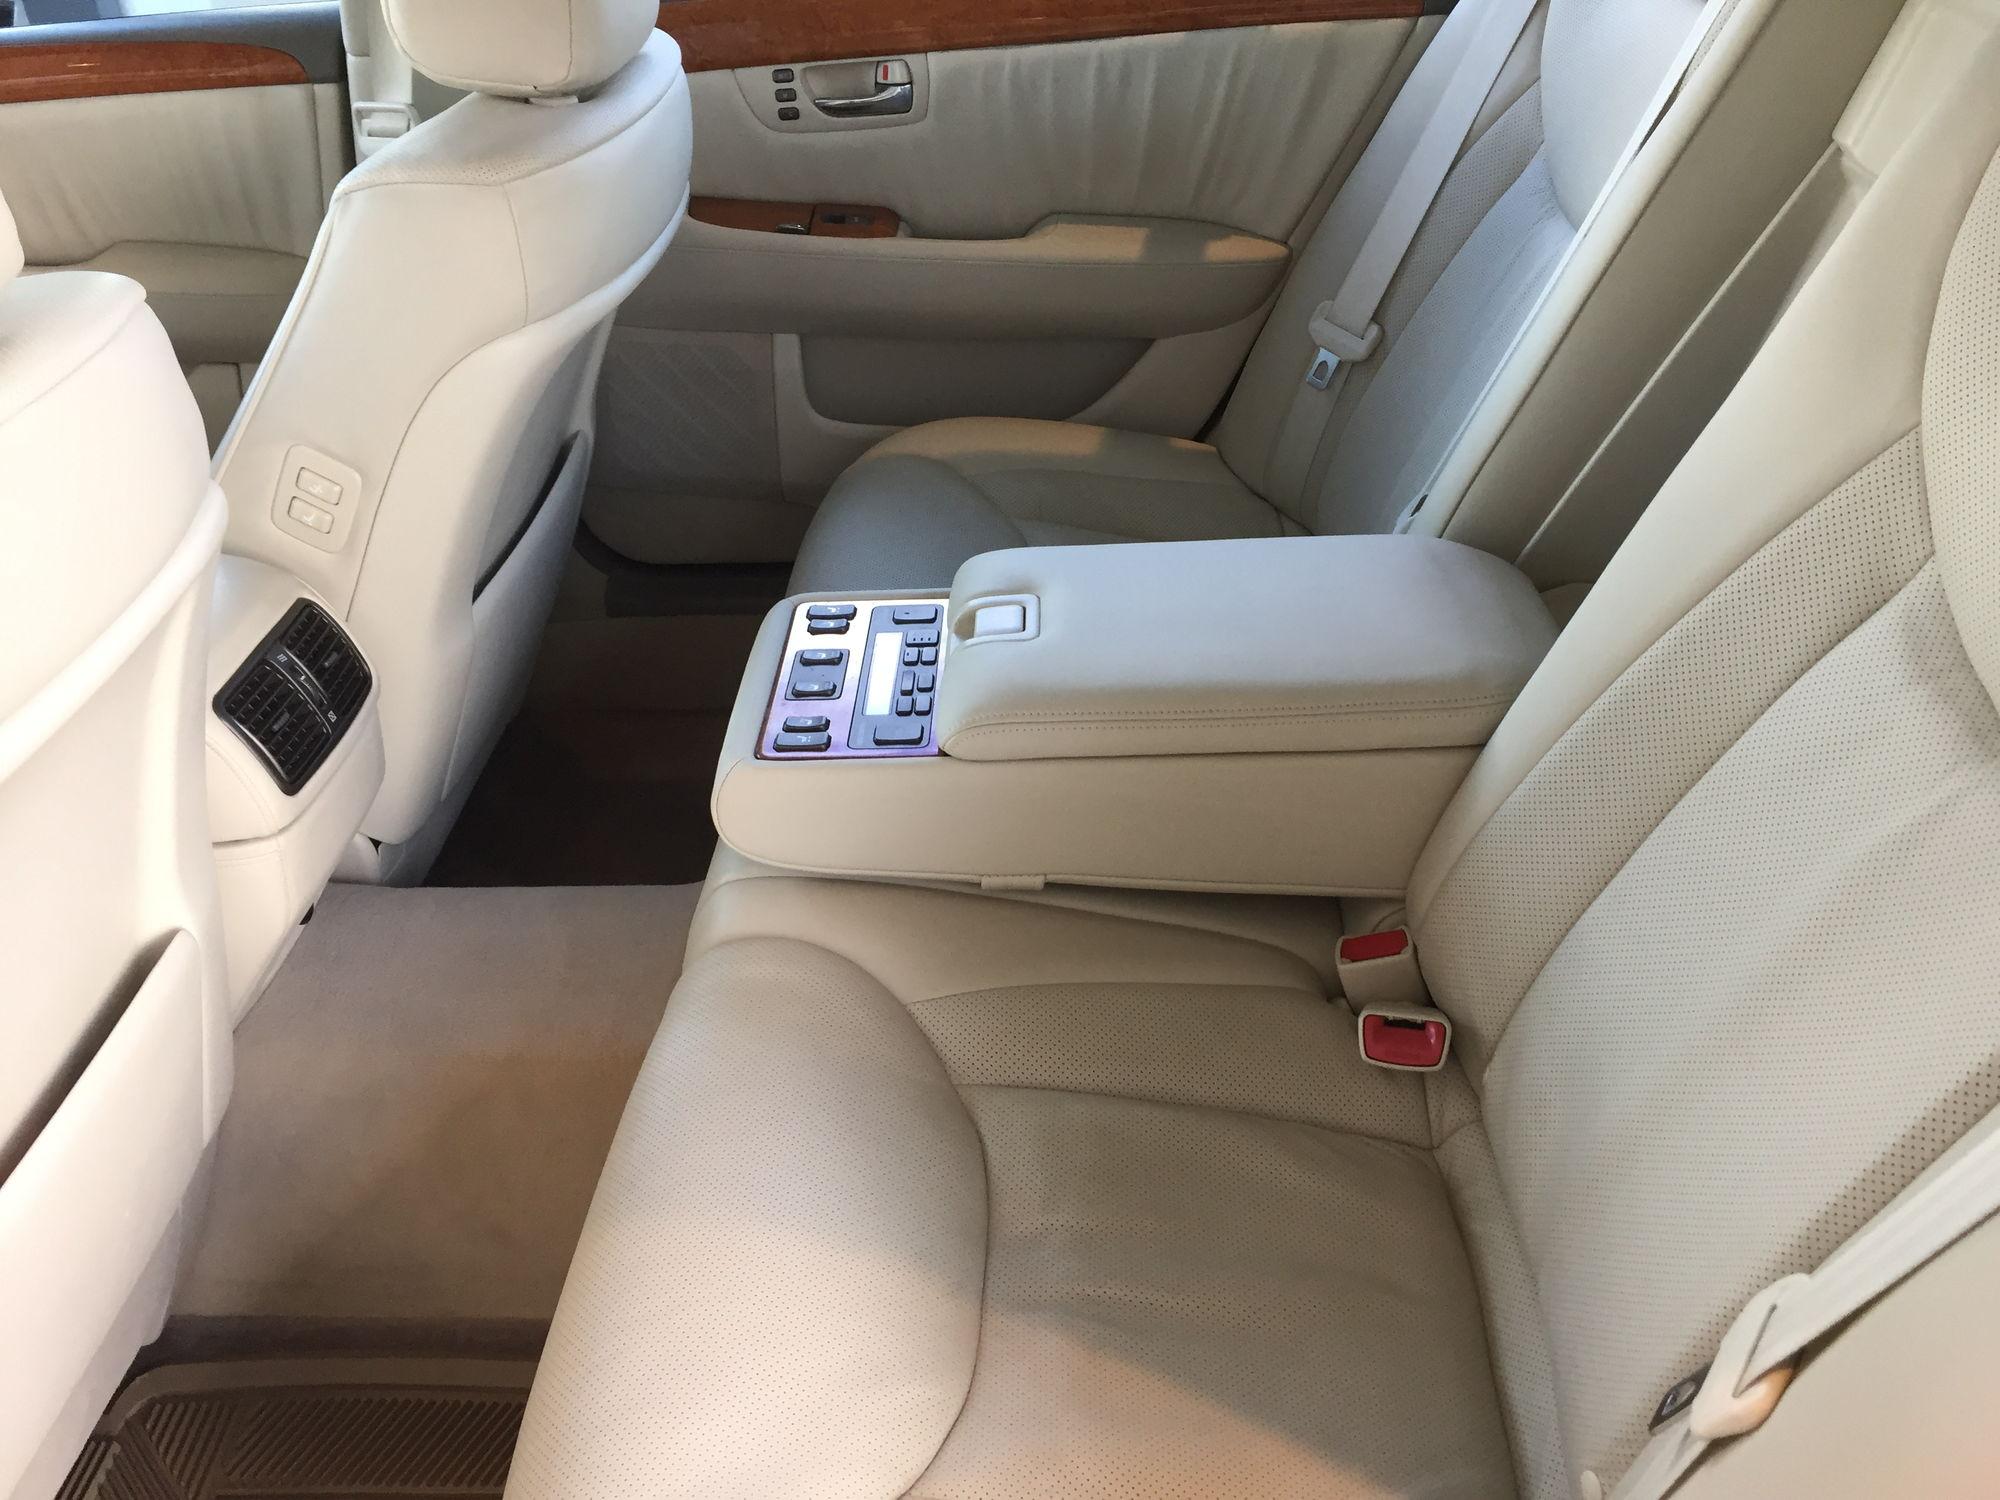 Tn 2005 Ls430 Ultra Luxury Radar Pcs Clublexus Lexus